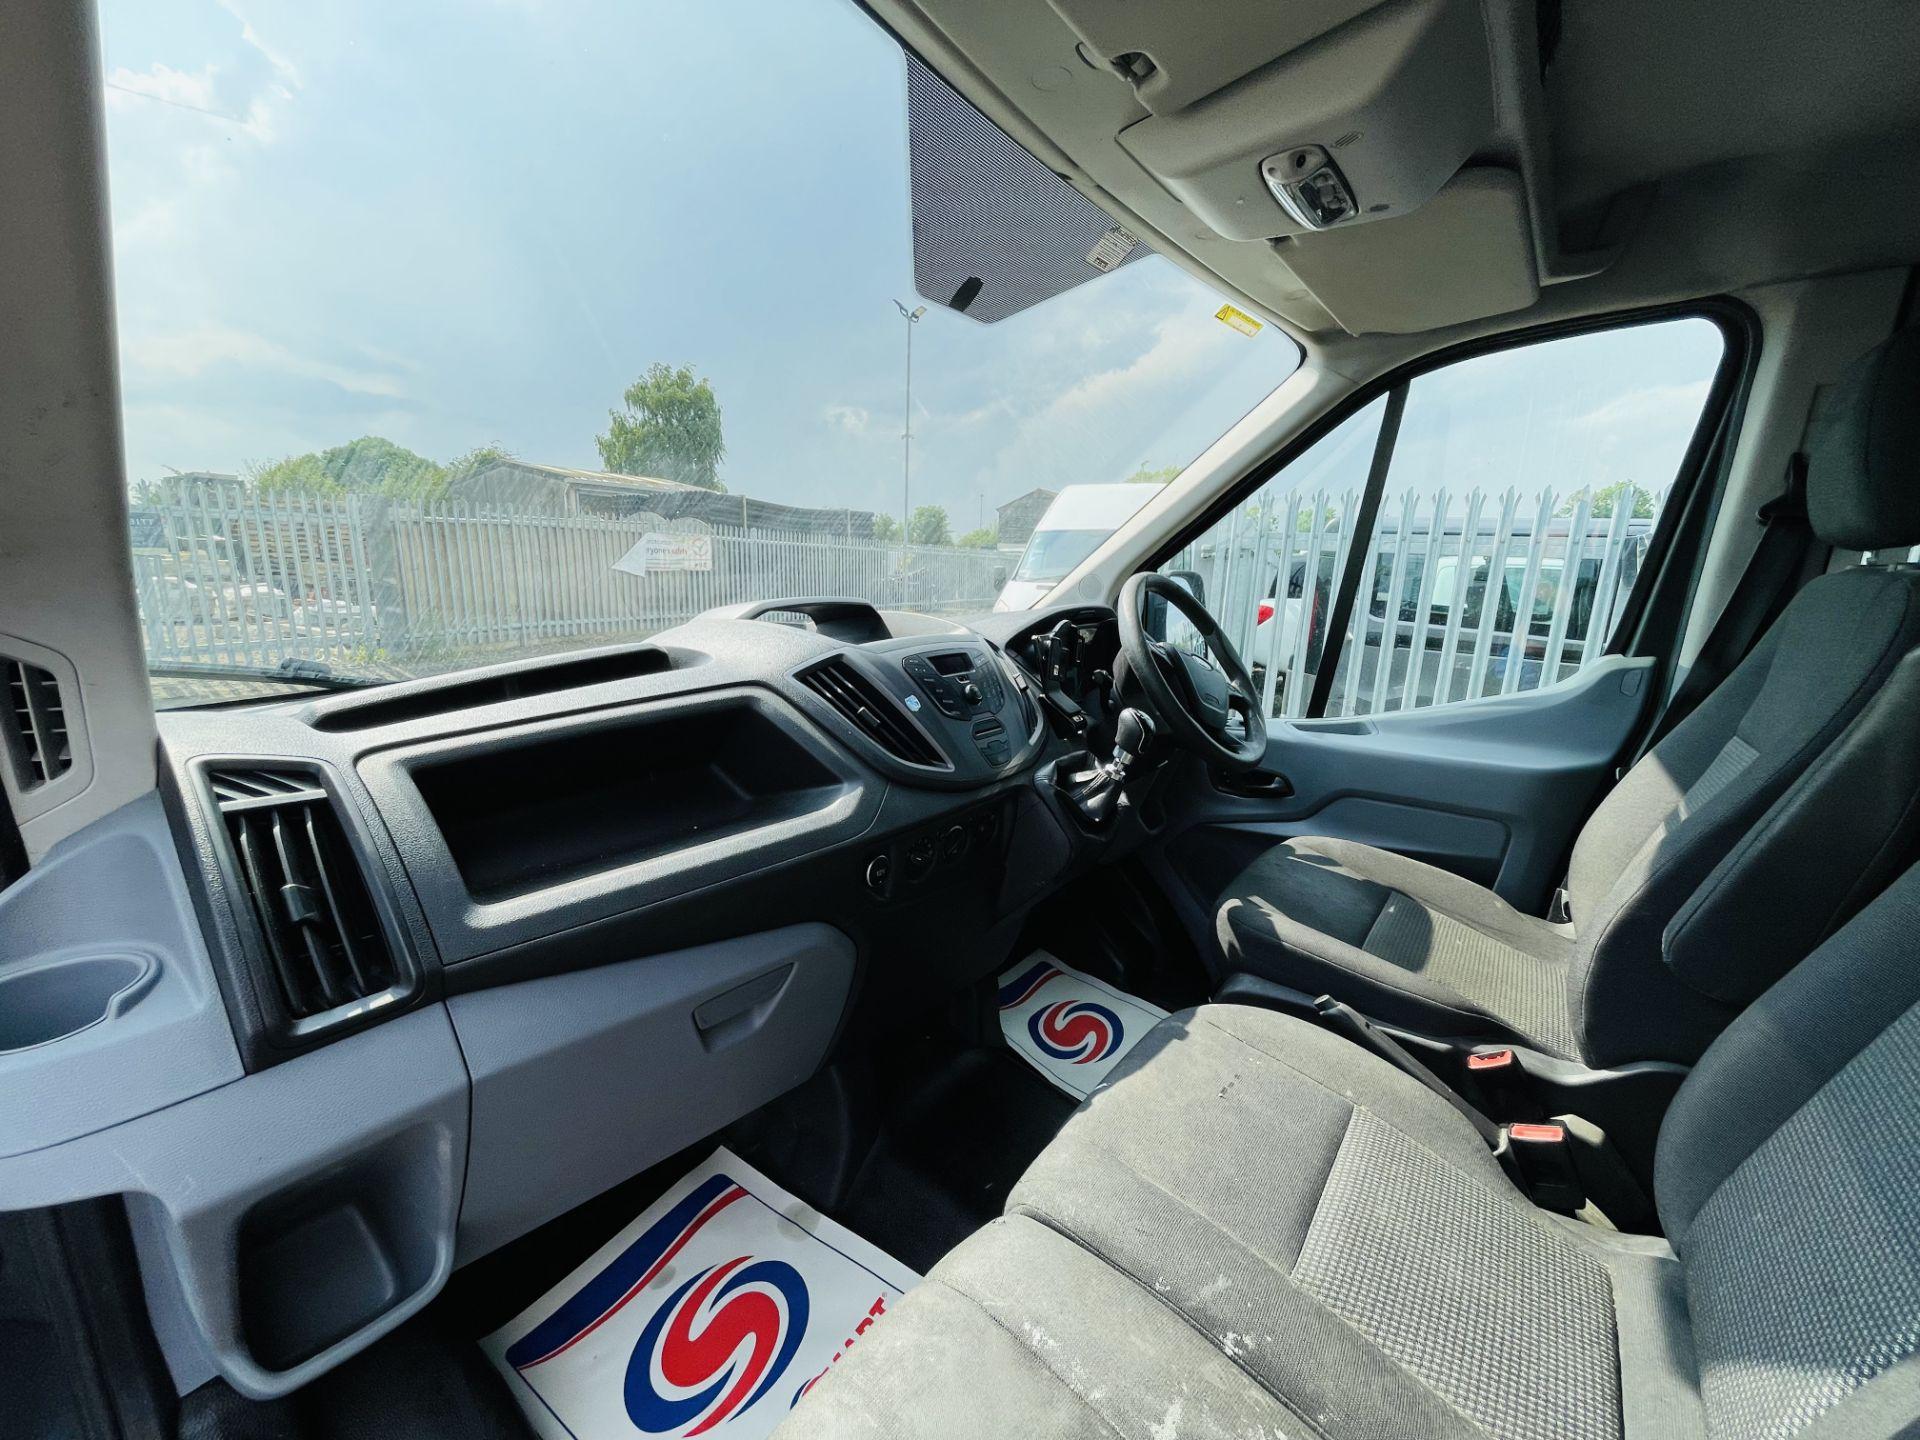 Ford Transit 2.2 TDCI 100 L3 H2 T350 2015 '65 Reg' - Panel Van - LCV - Grey - Image 4 of 14